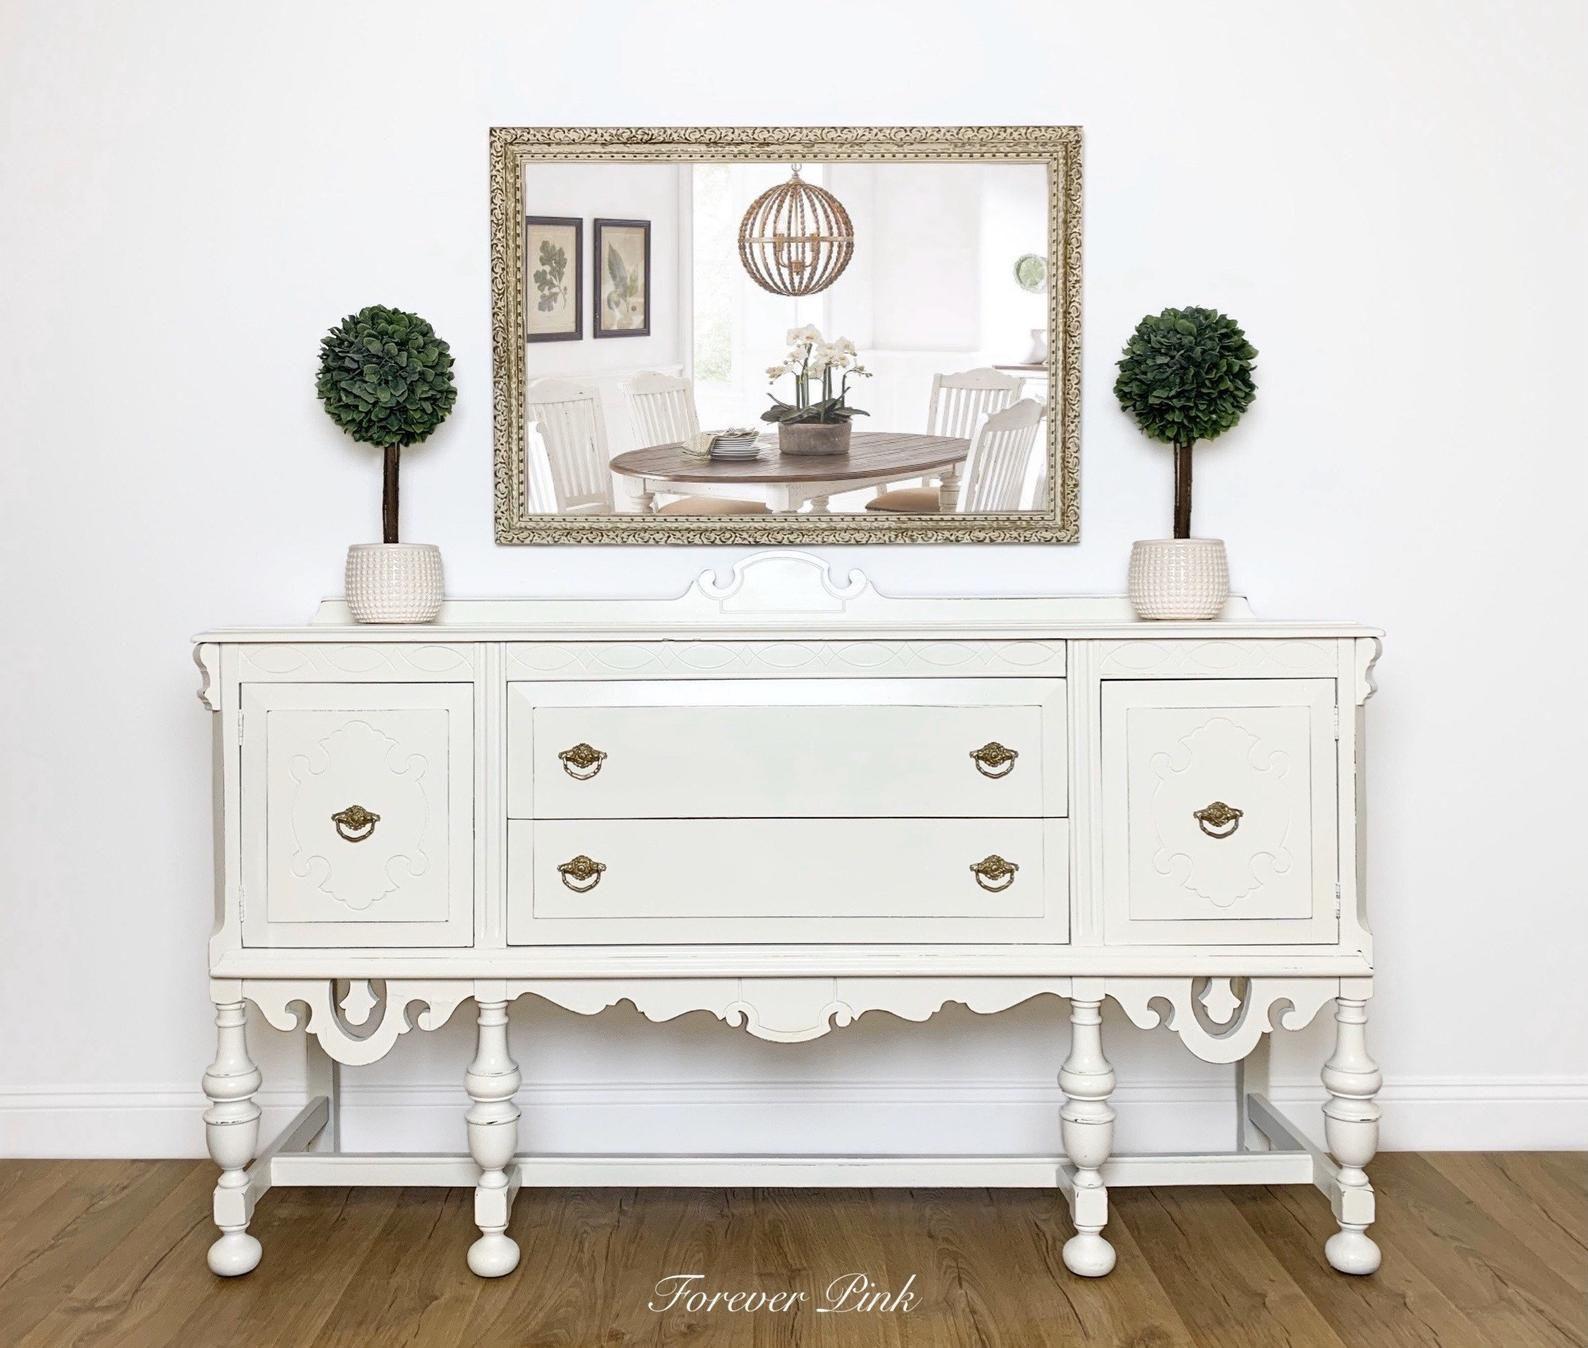 New Vintage White Jacobean Sideboard Buffet Painted Antique Etsy White Vintage Vintage House New Vintage [ 1348 x 1588 Pixel ]